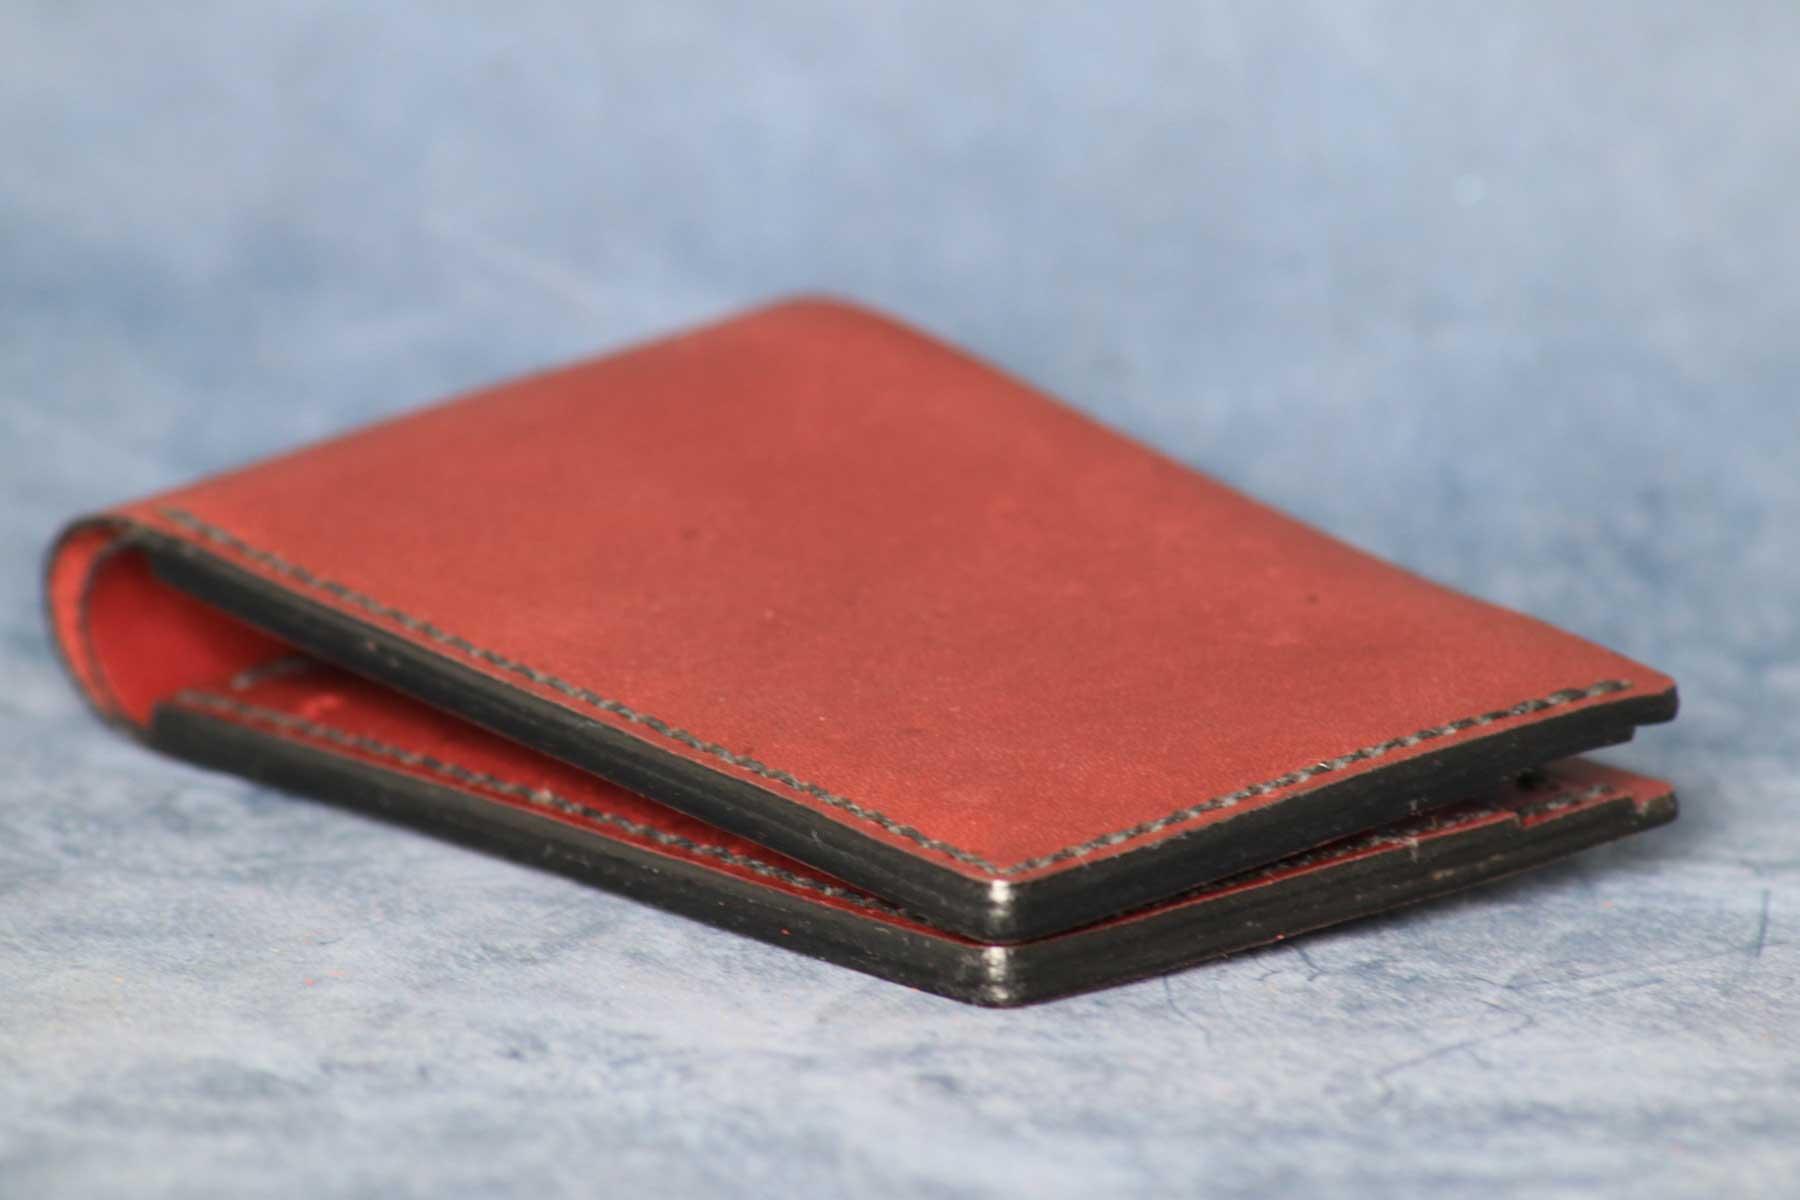 09_Bifold-Wallet-06.jpg